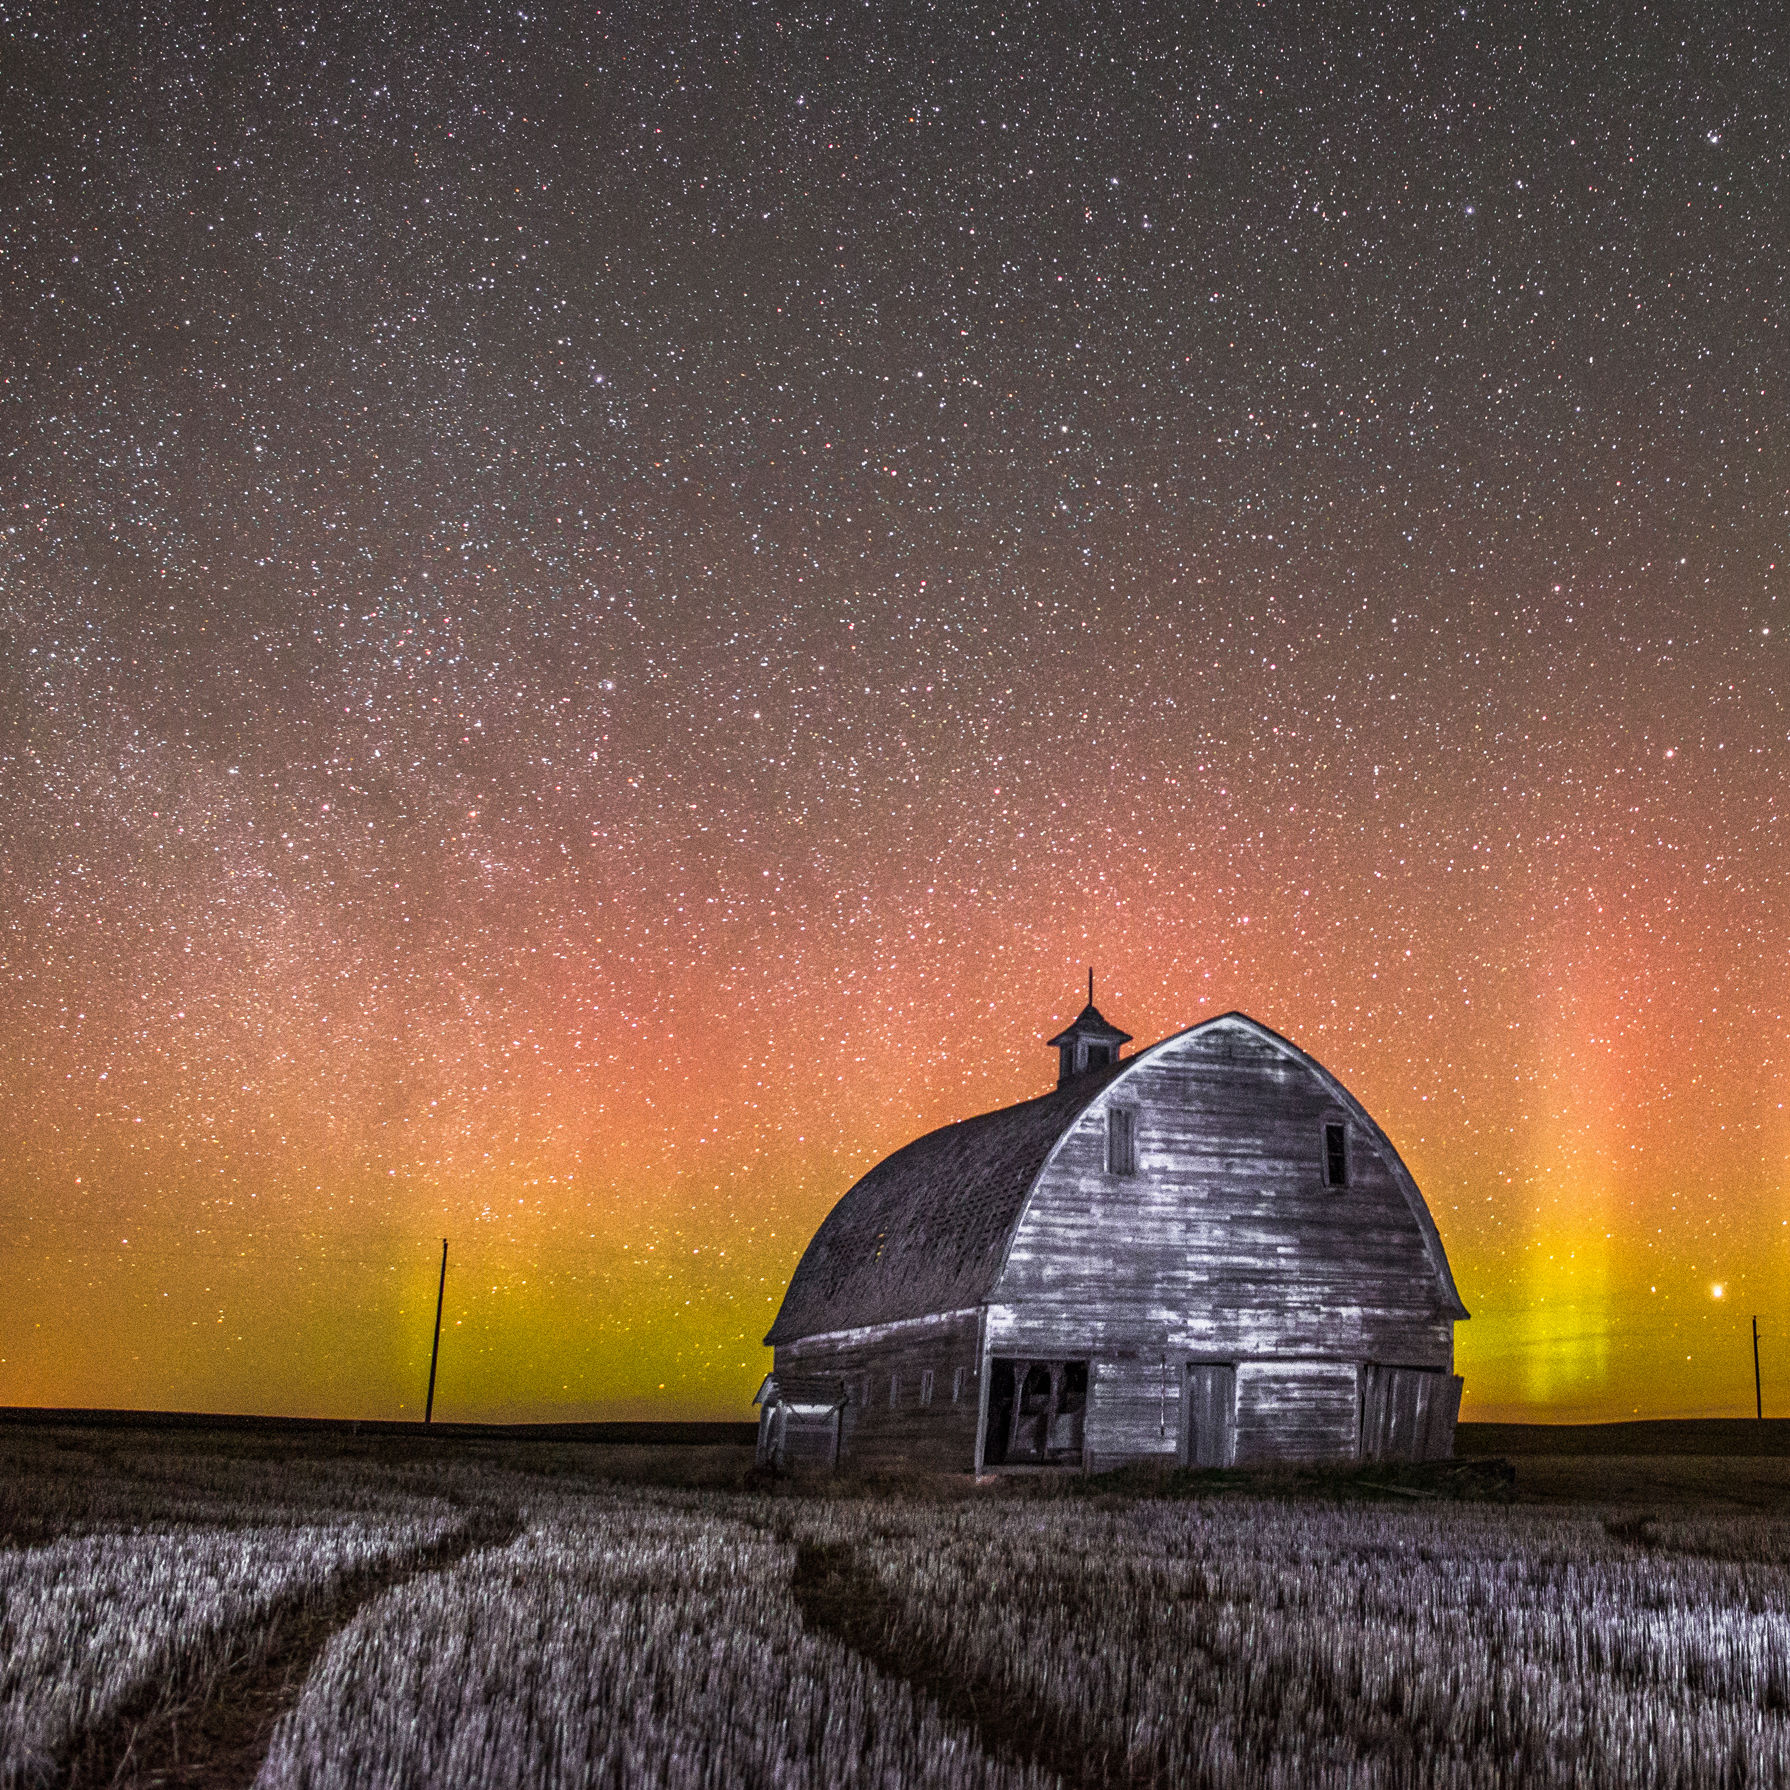 Jis 0616 night sky aurora borealis hd8oy1